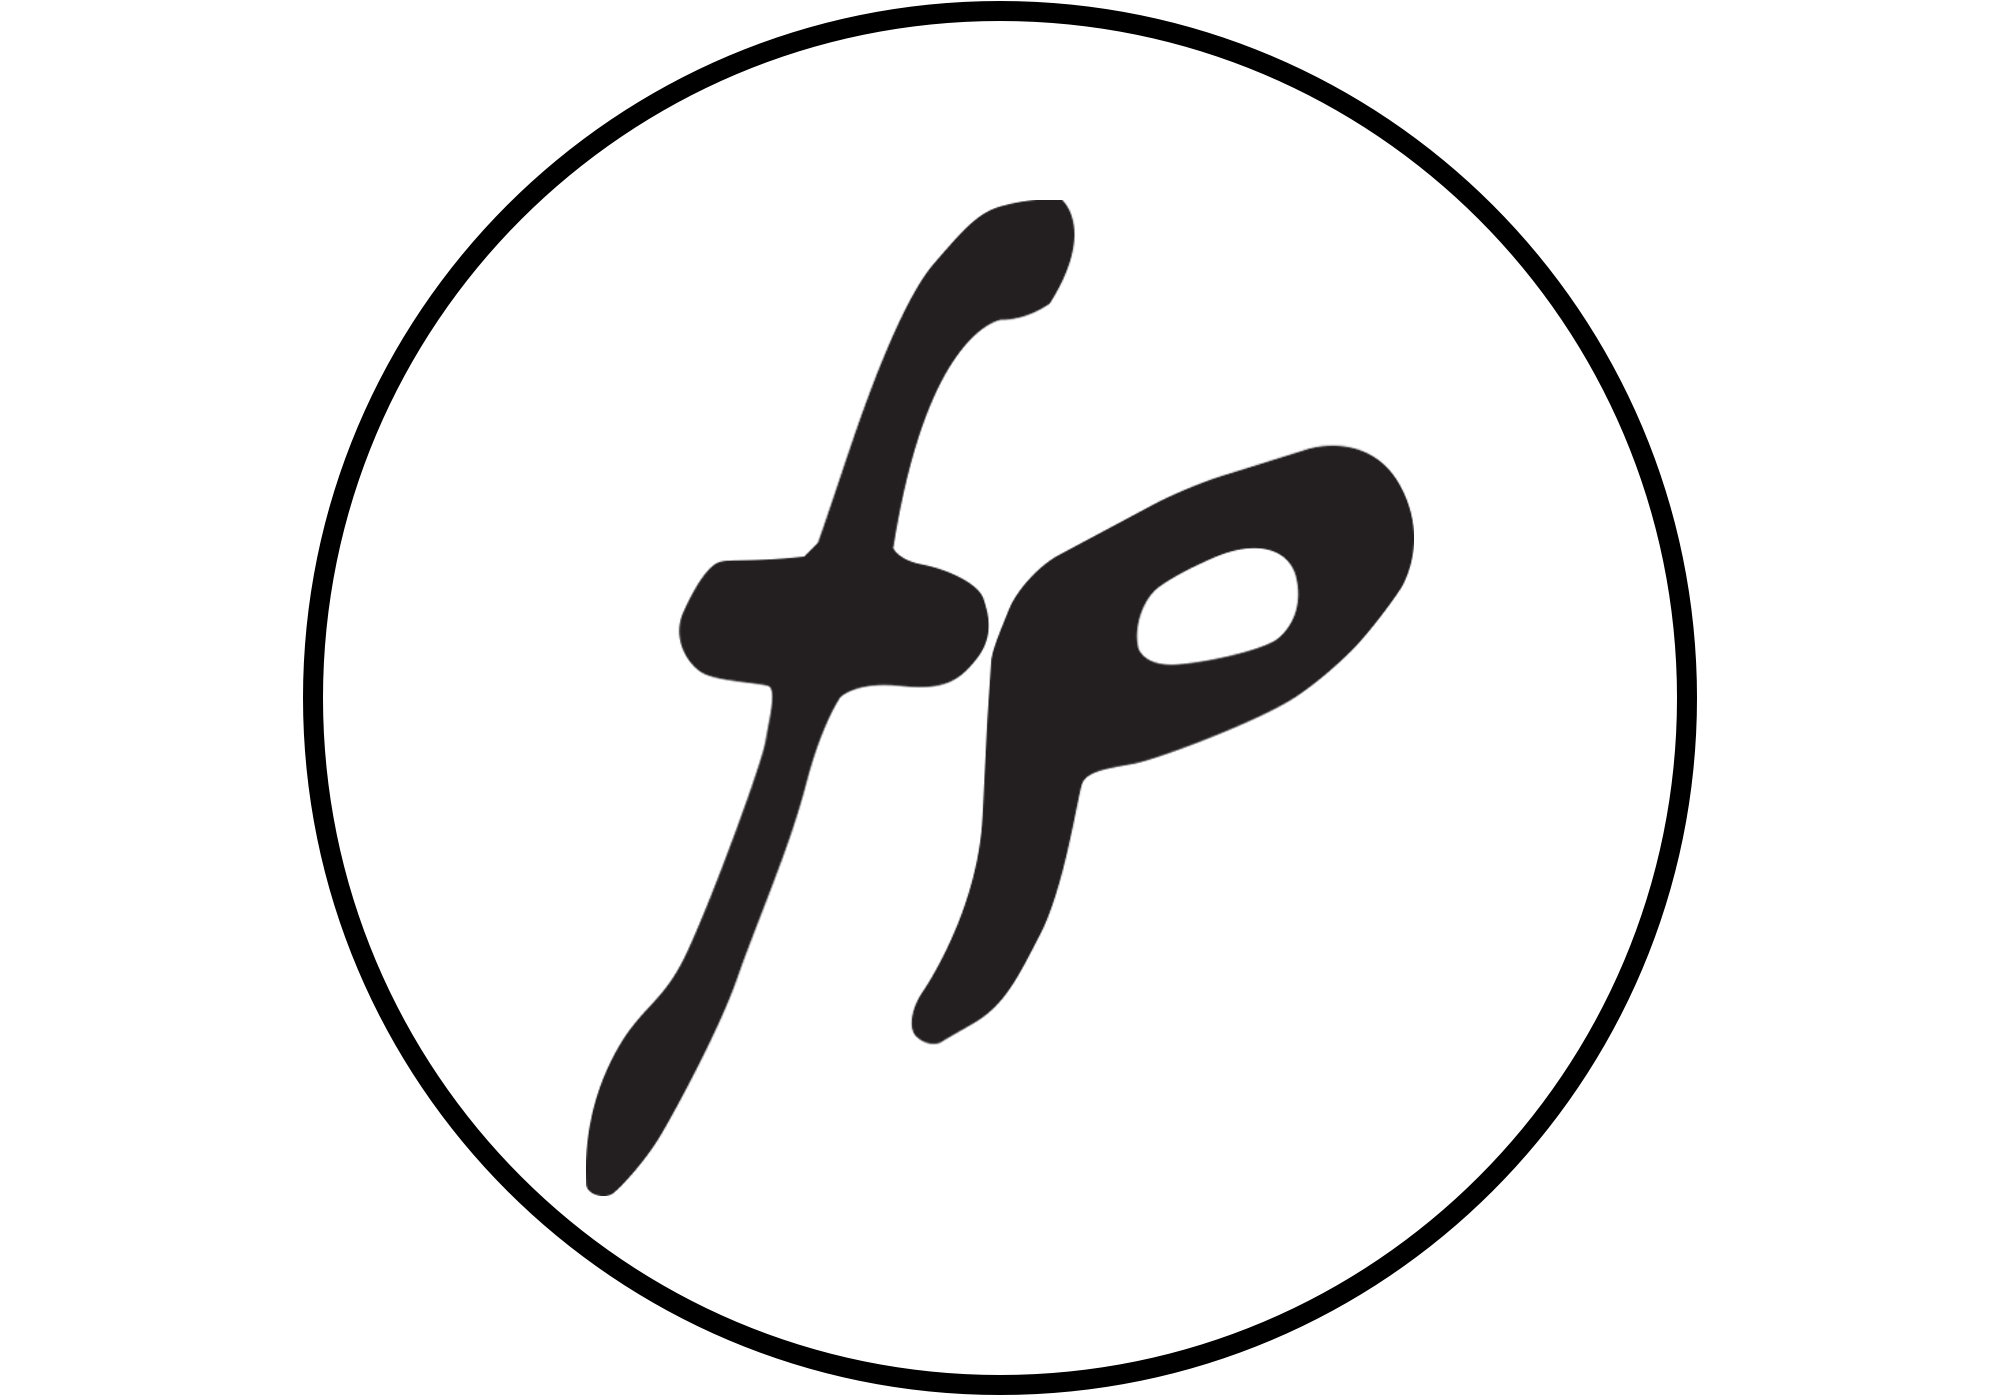 FP Black Ring.jpeg